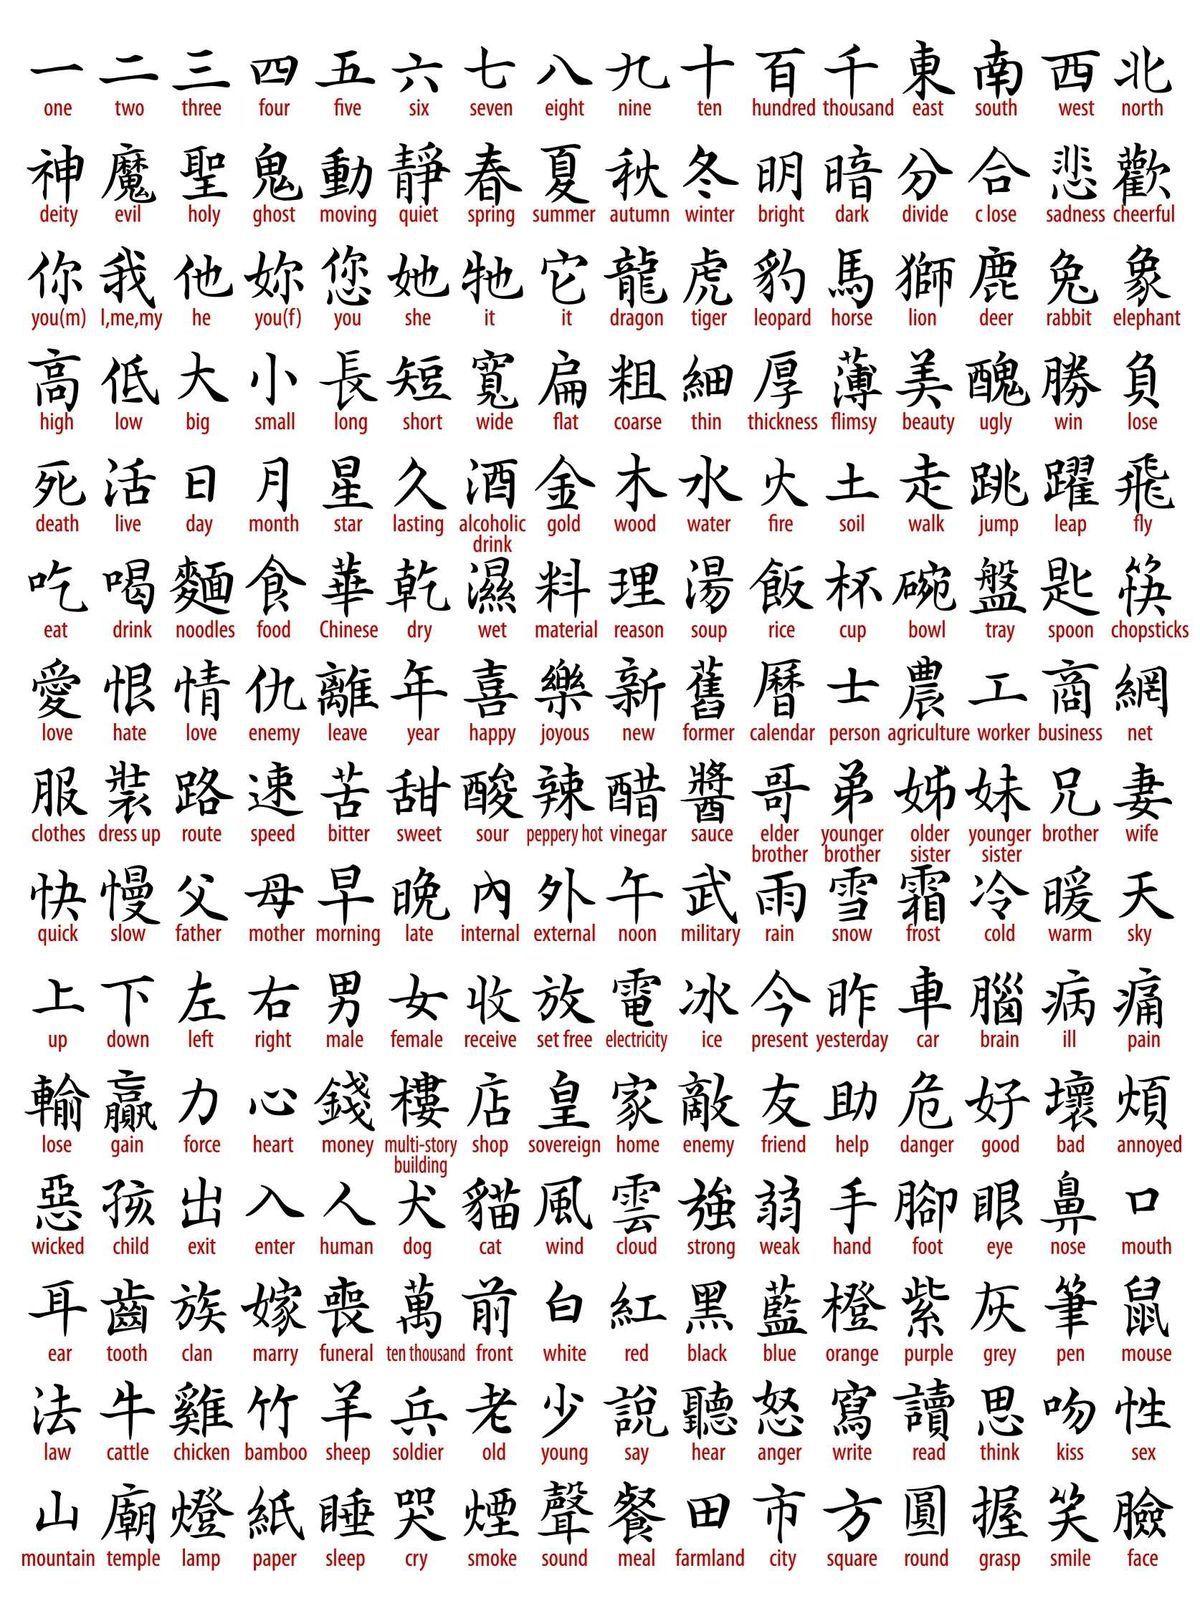 Pin by jem Marsh on Hedging | Chinese symbols, Mayan symbols